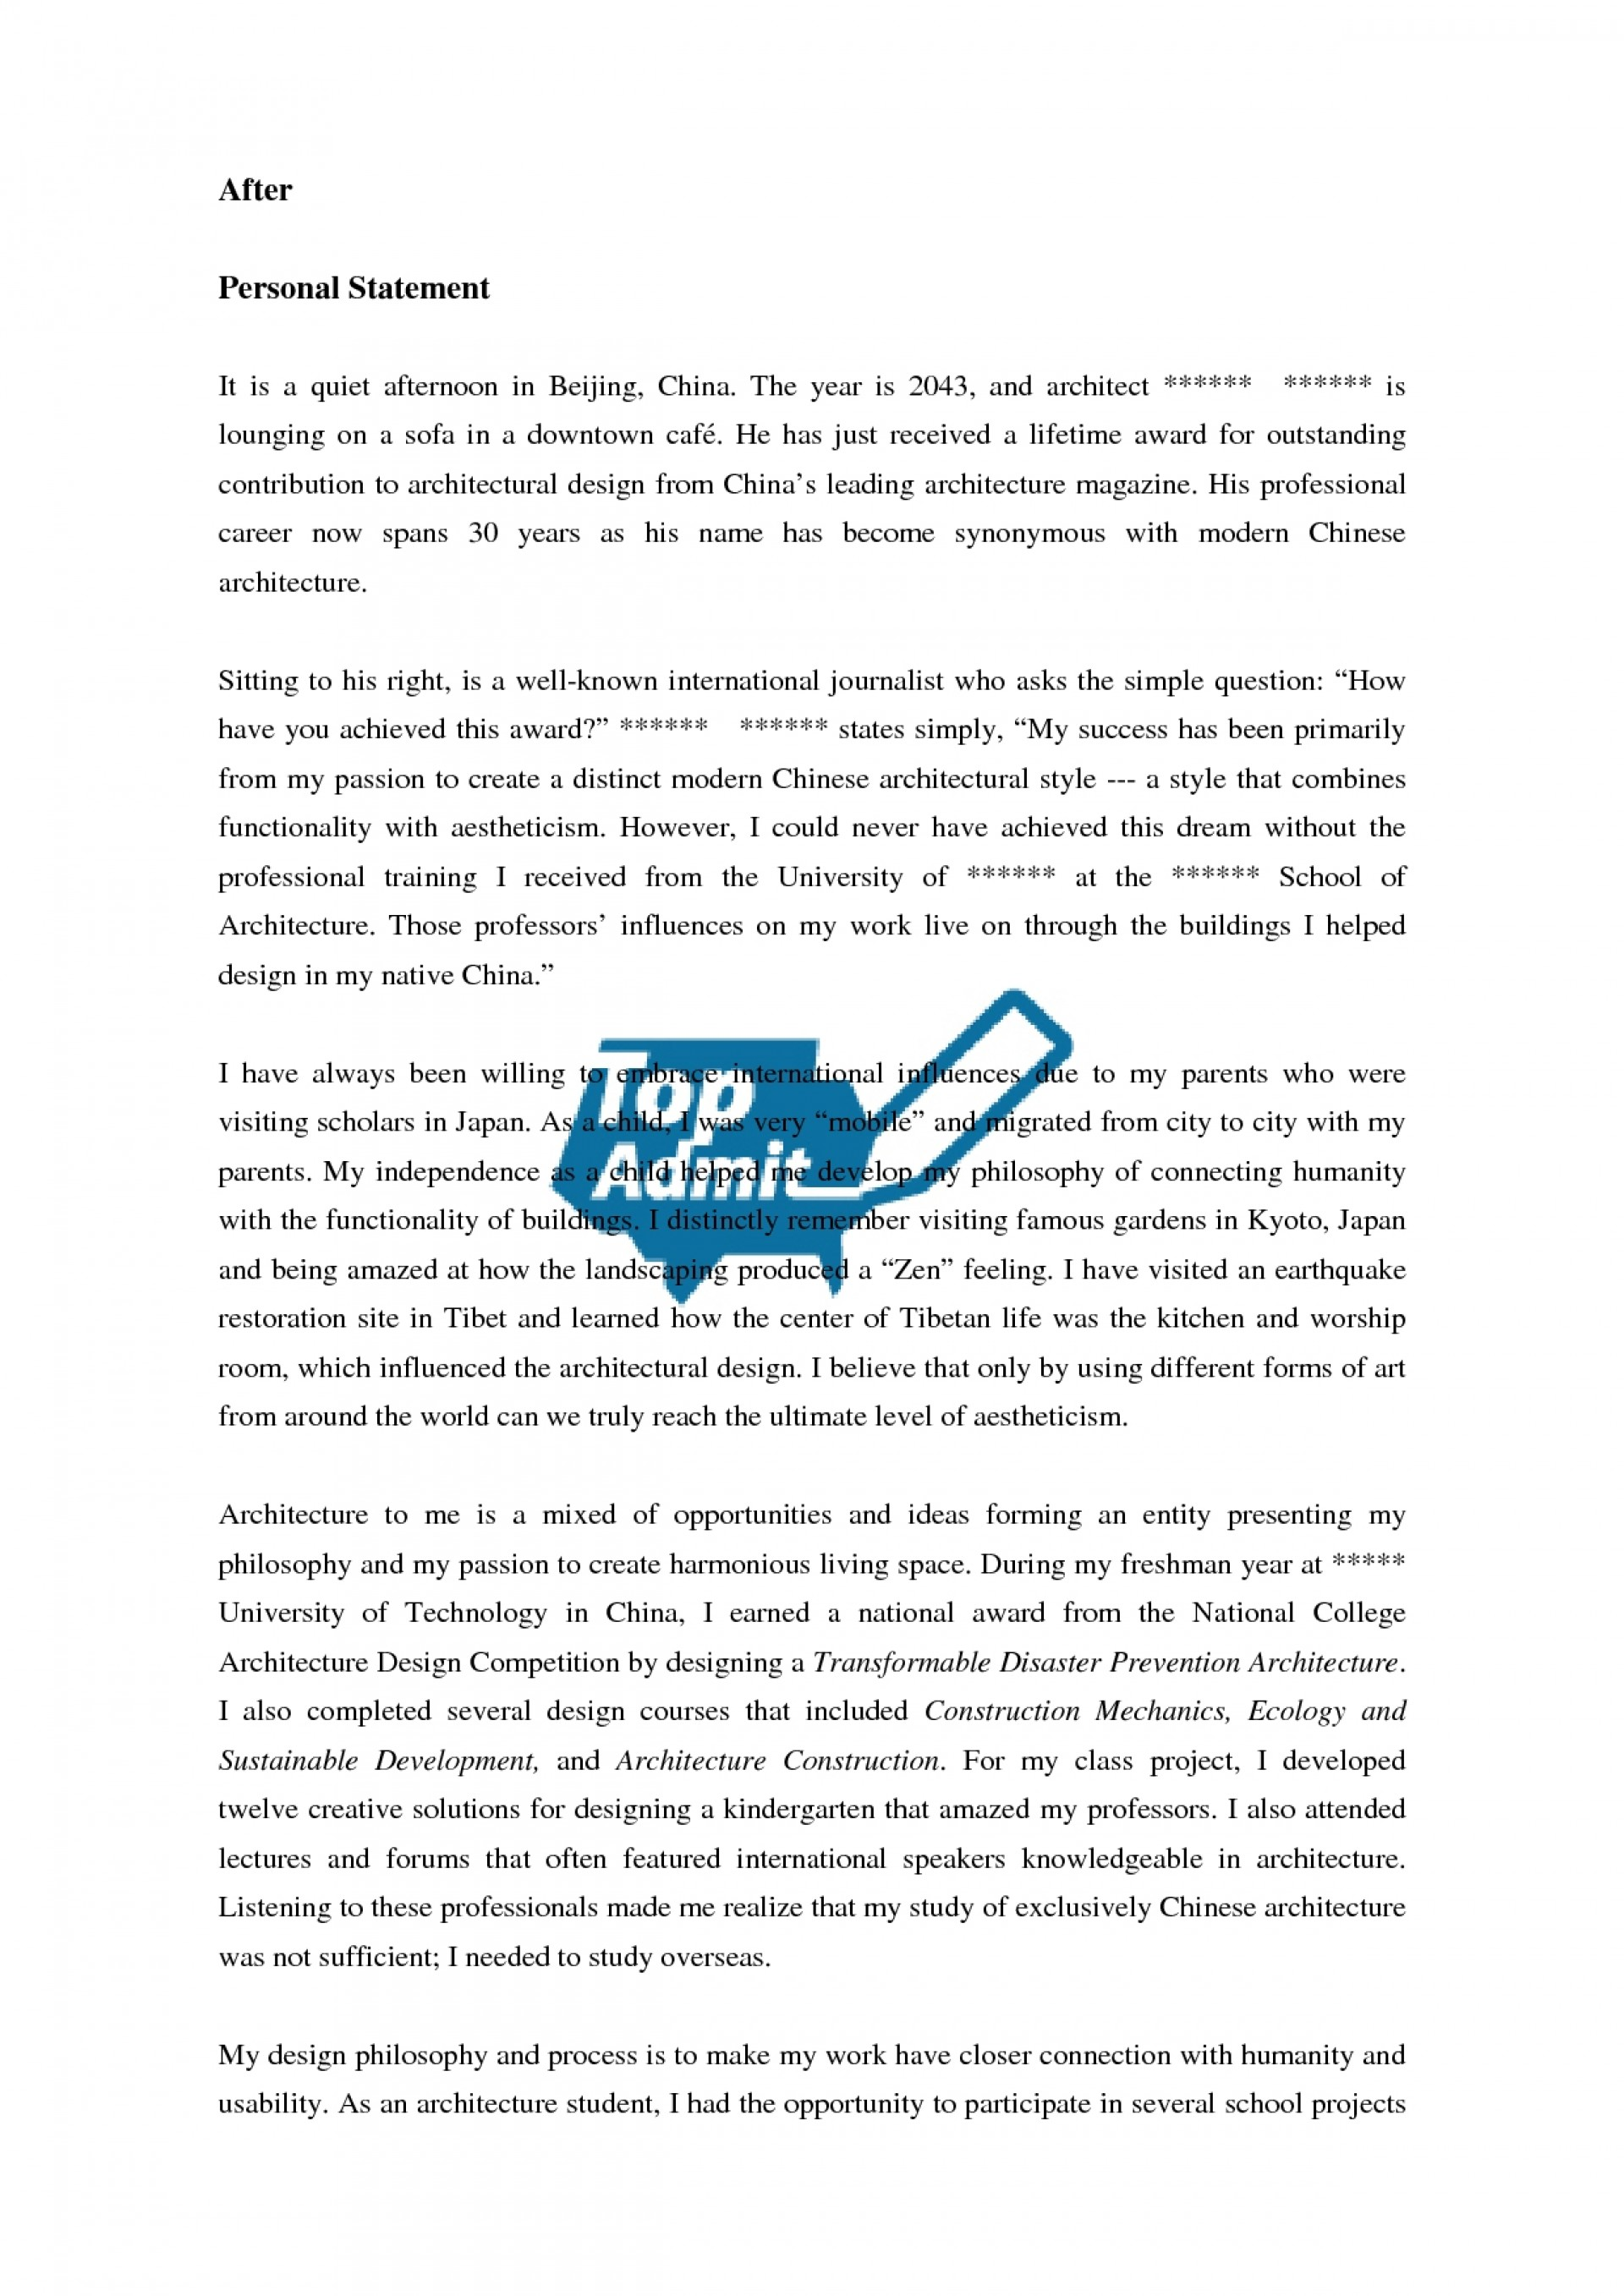 026 Zwjgmmd Common App Examples Best Example Essays Application Essay Harvard Prompts 2014-15 1920